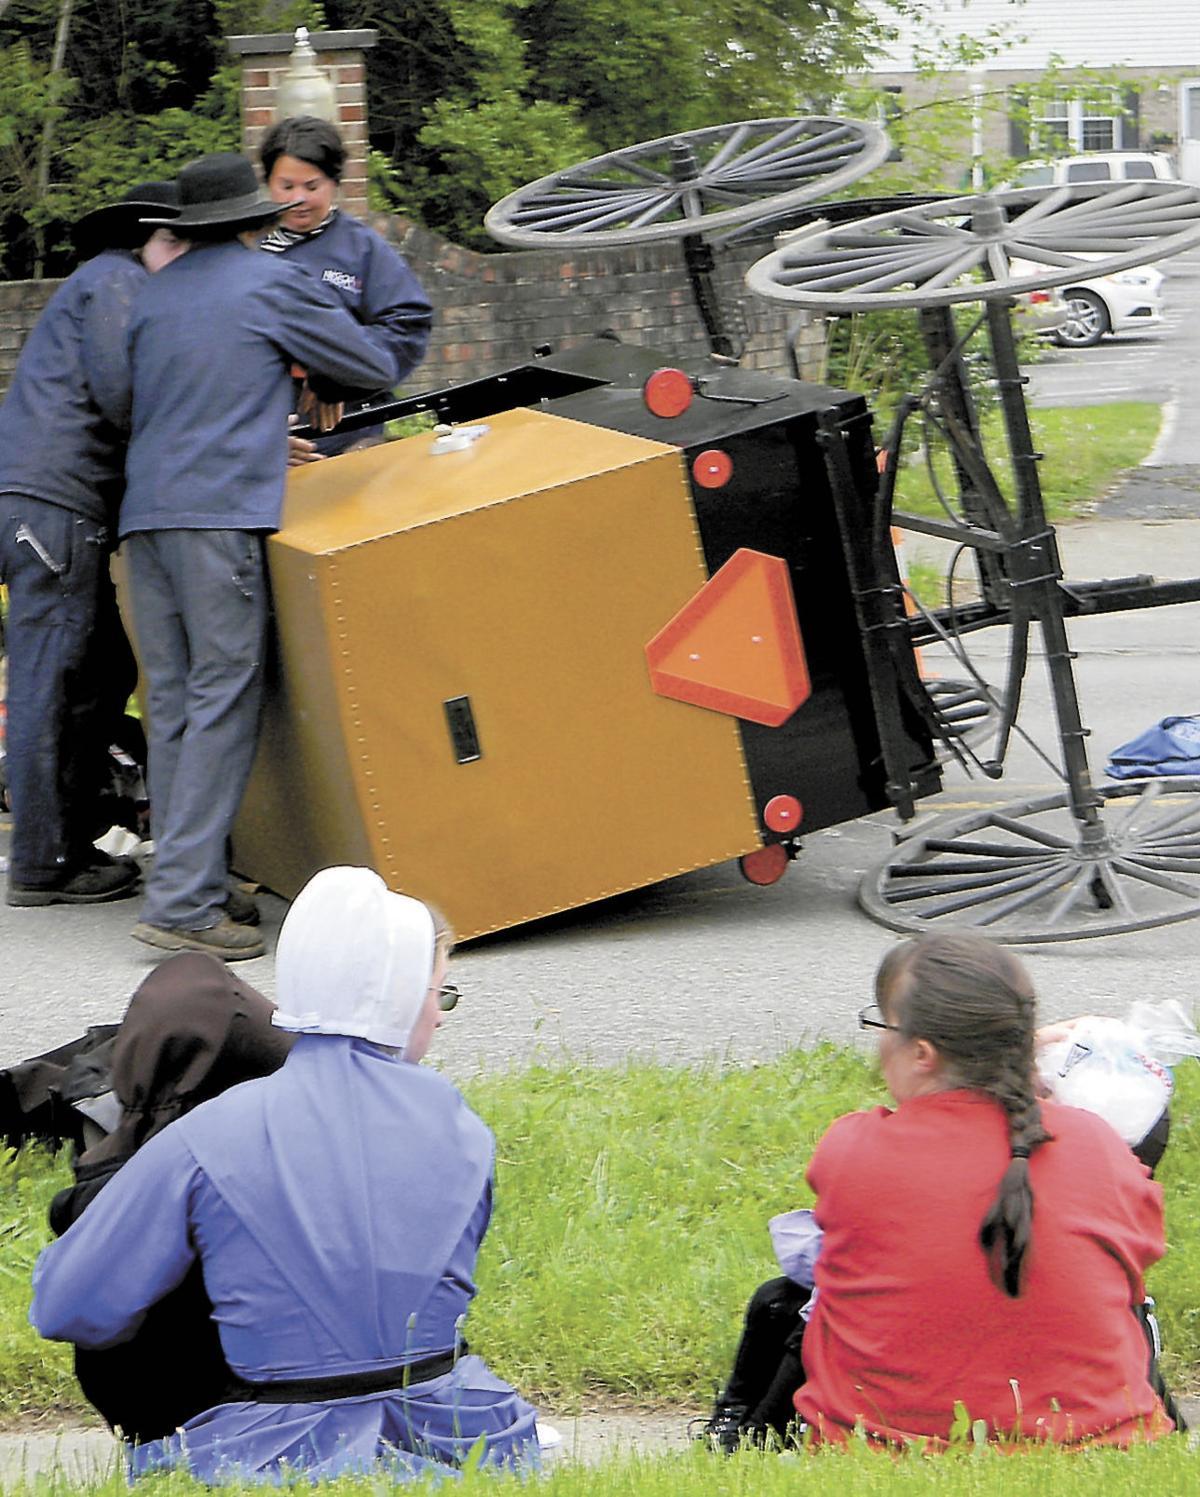 Amish Woman, Children Injured In Pennsylvania Car-buggy